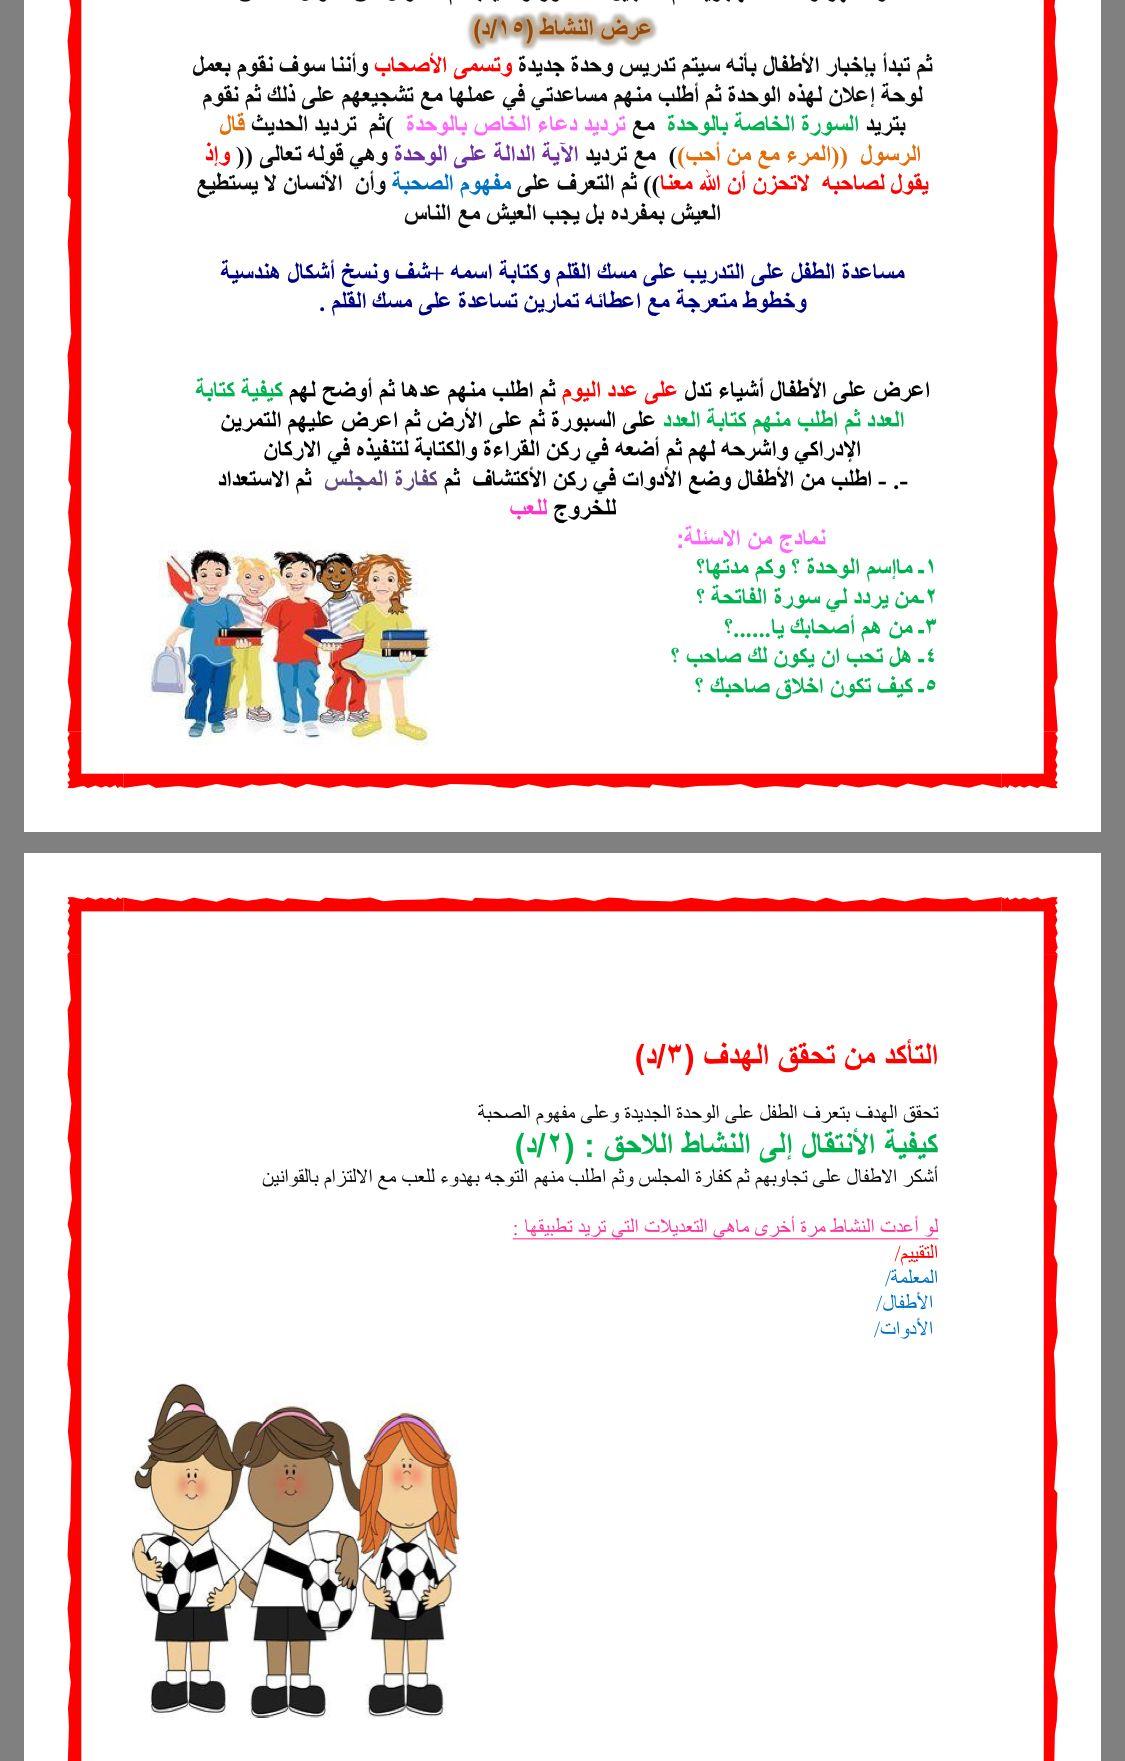 Pin By Njaad On وحدة الاصحاب Comics Peanuts Comics